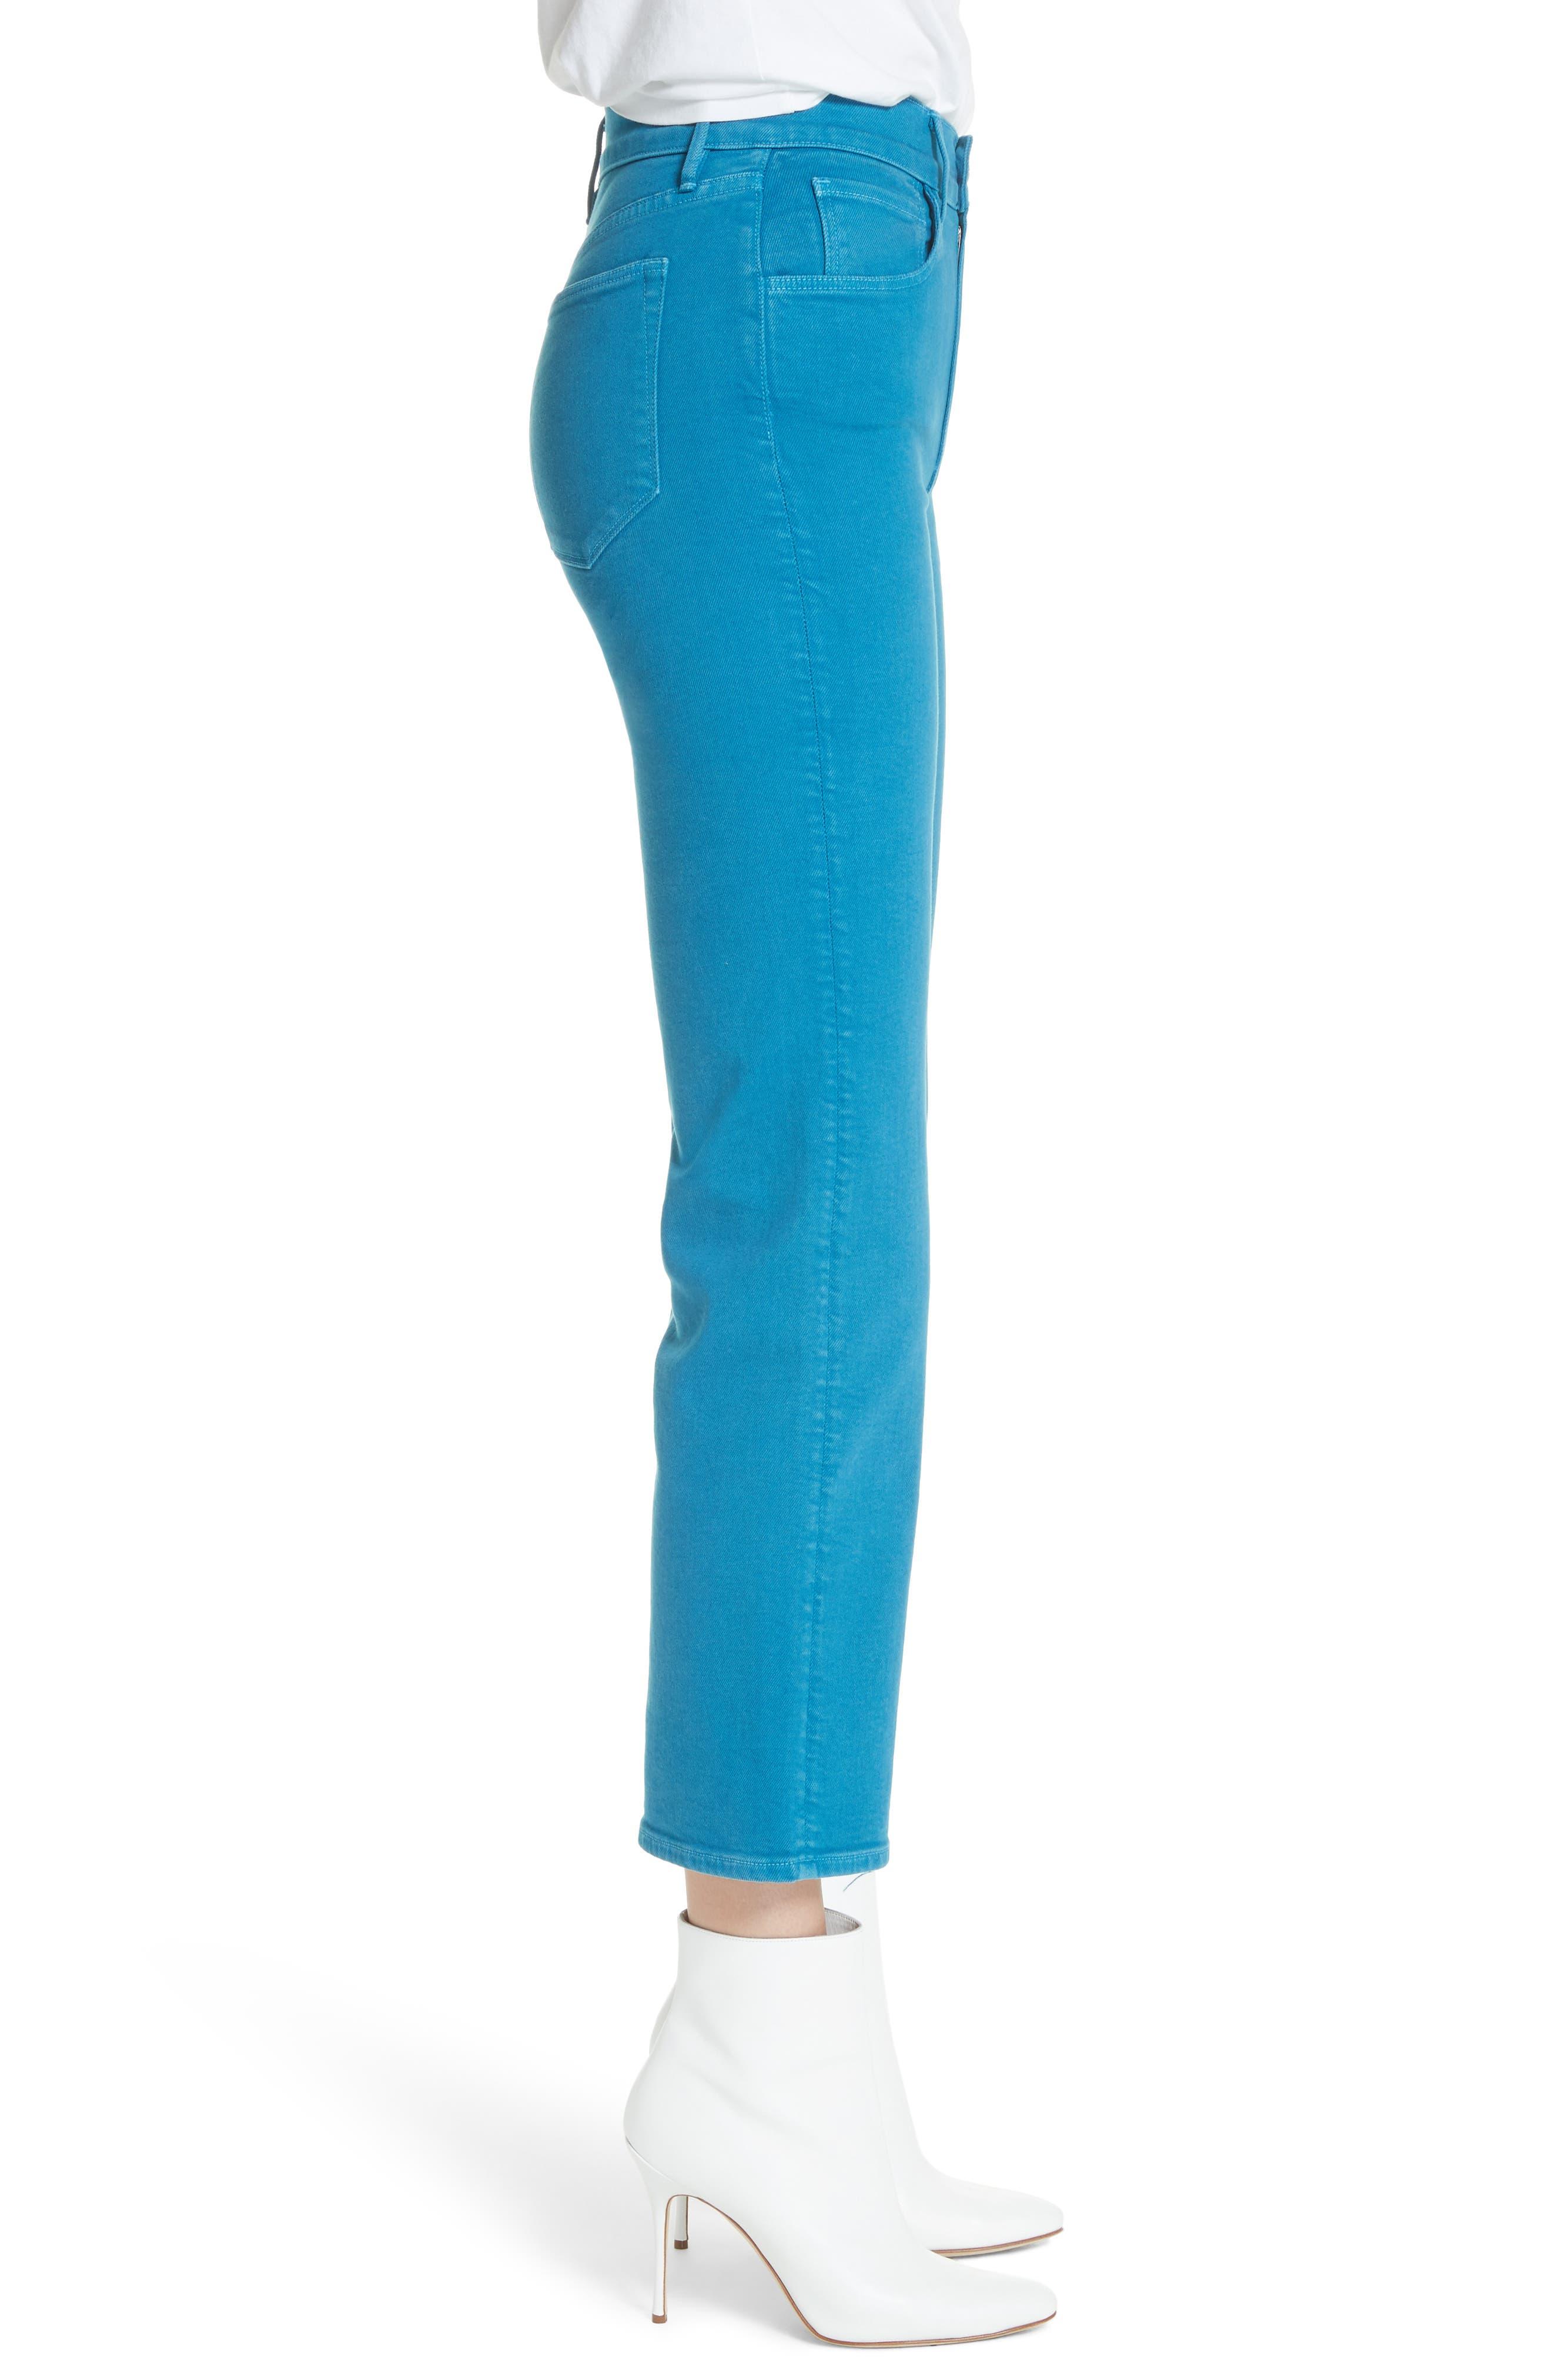 W4 Shelter Wide Leg Crop Jeans,                             Alternate thumbnail 3, color,                             Peacock Blue